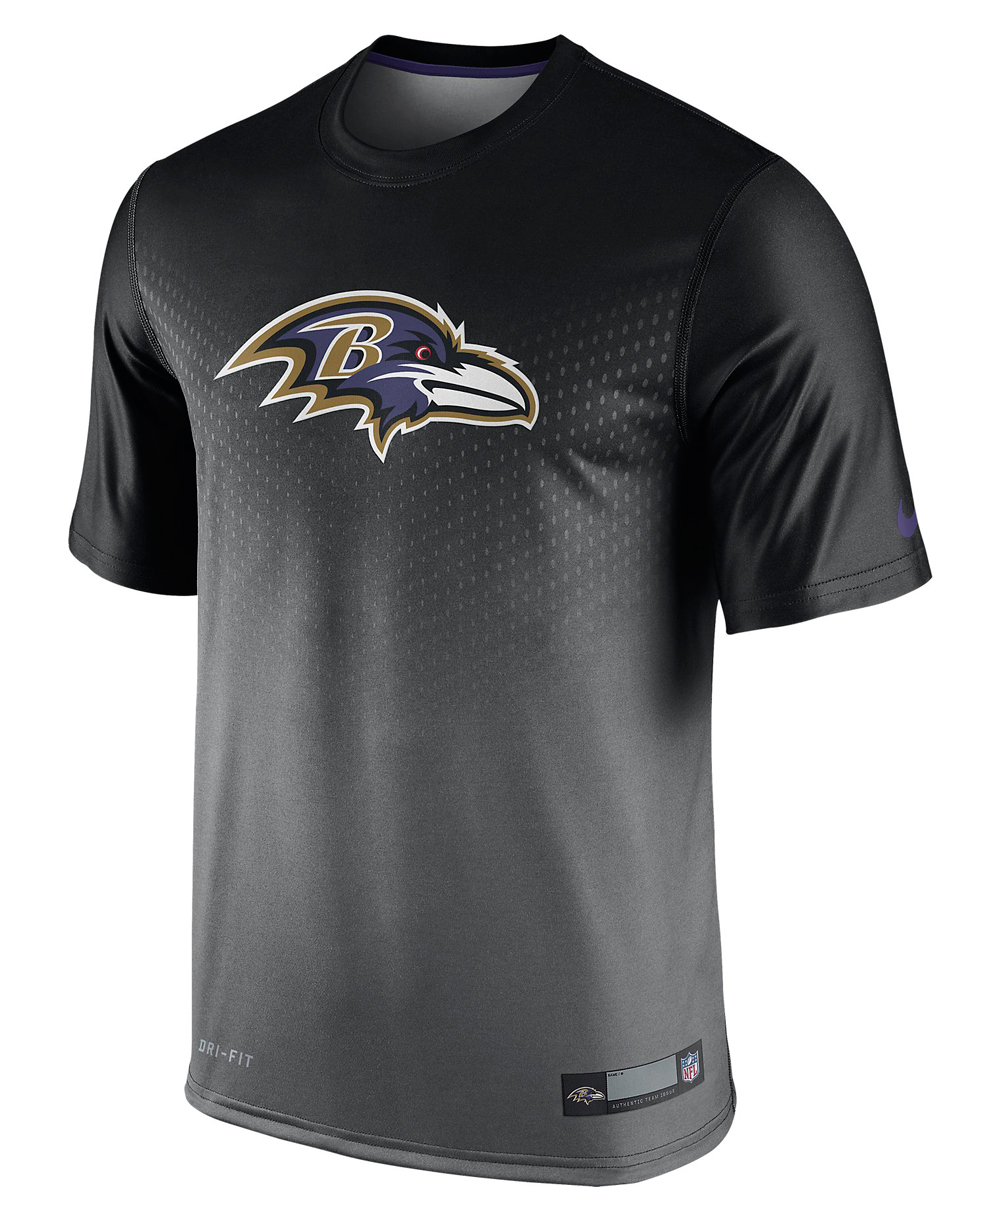 Legend Sideline Camiseta Manga Corta para Hombre NFL Baltimore Ravens